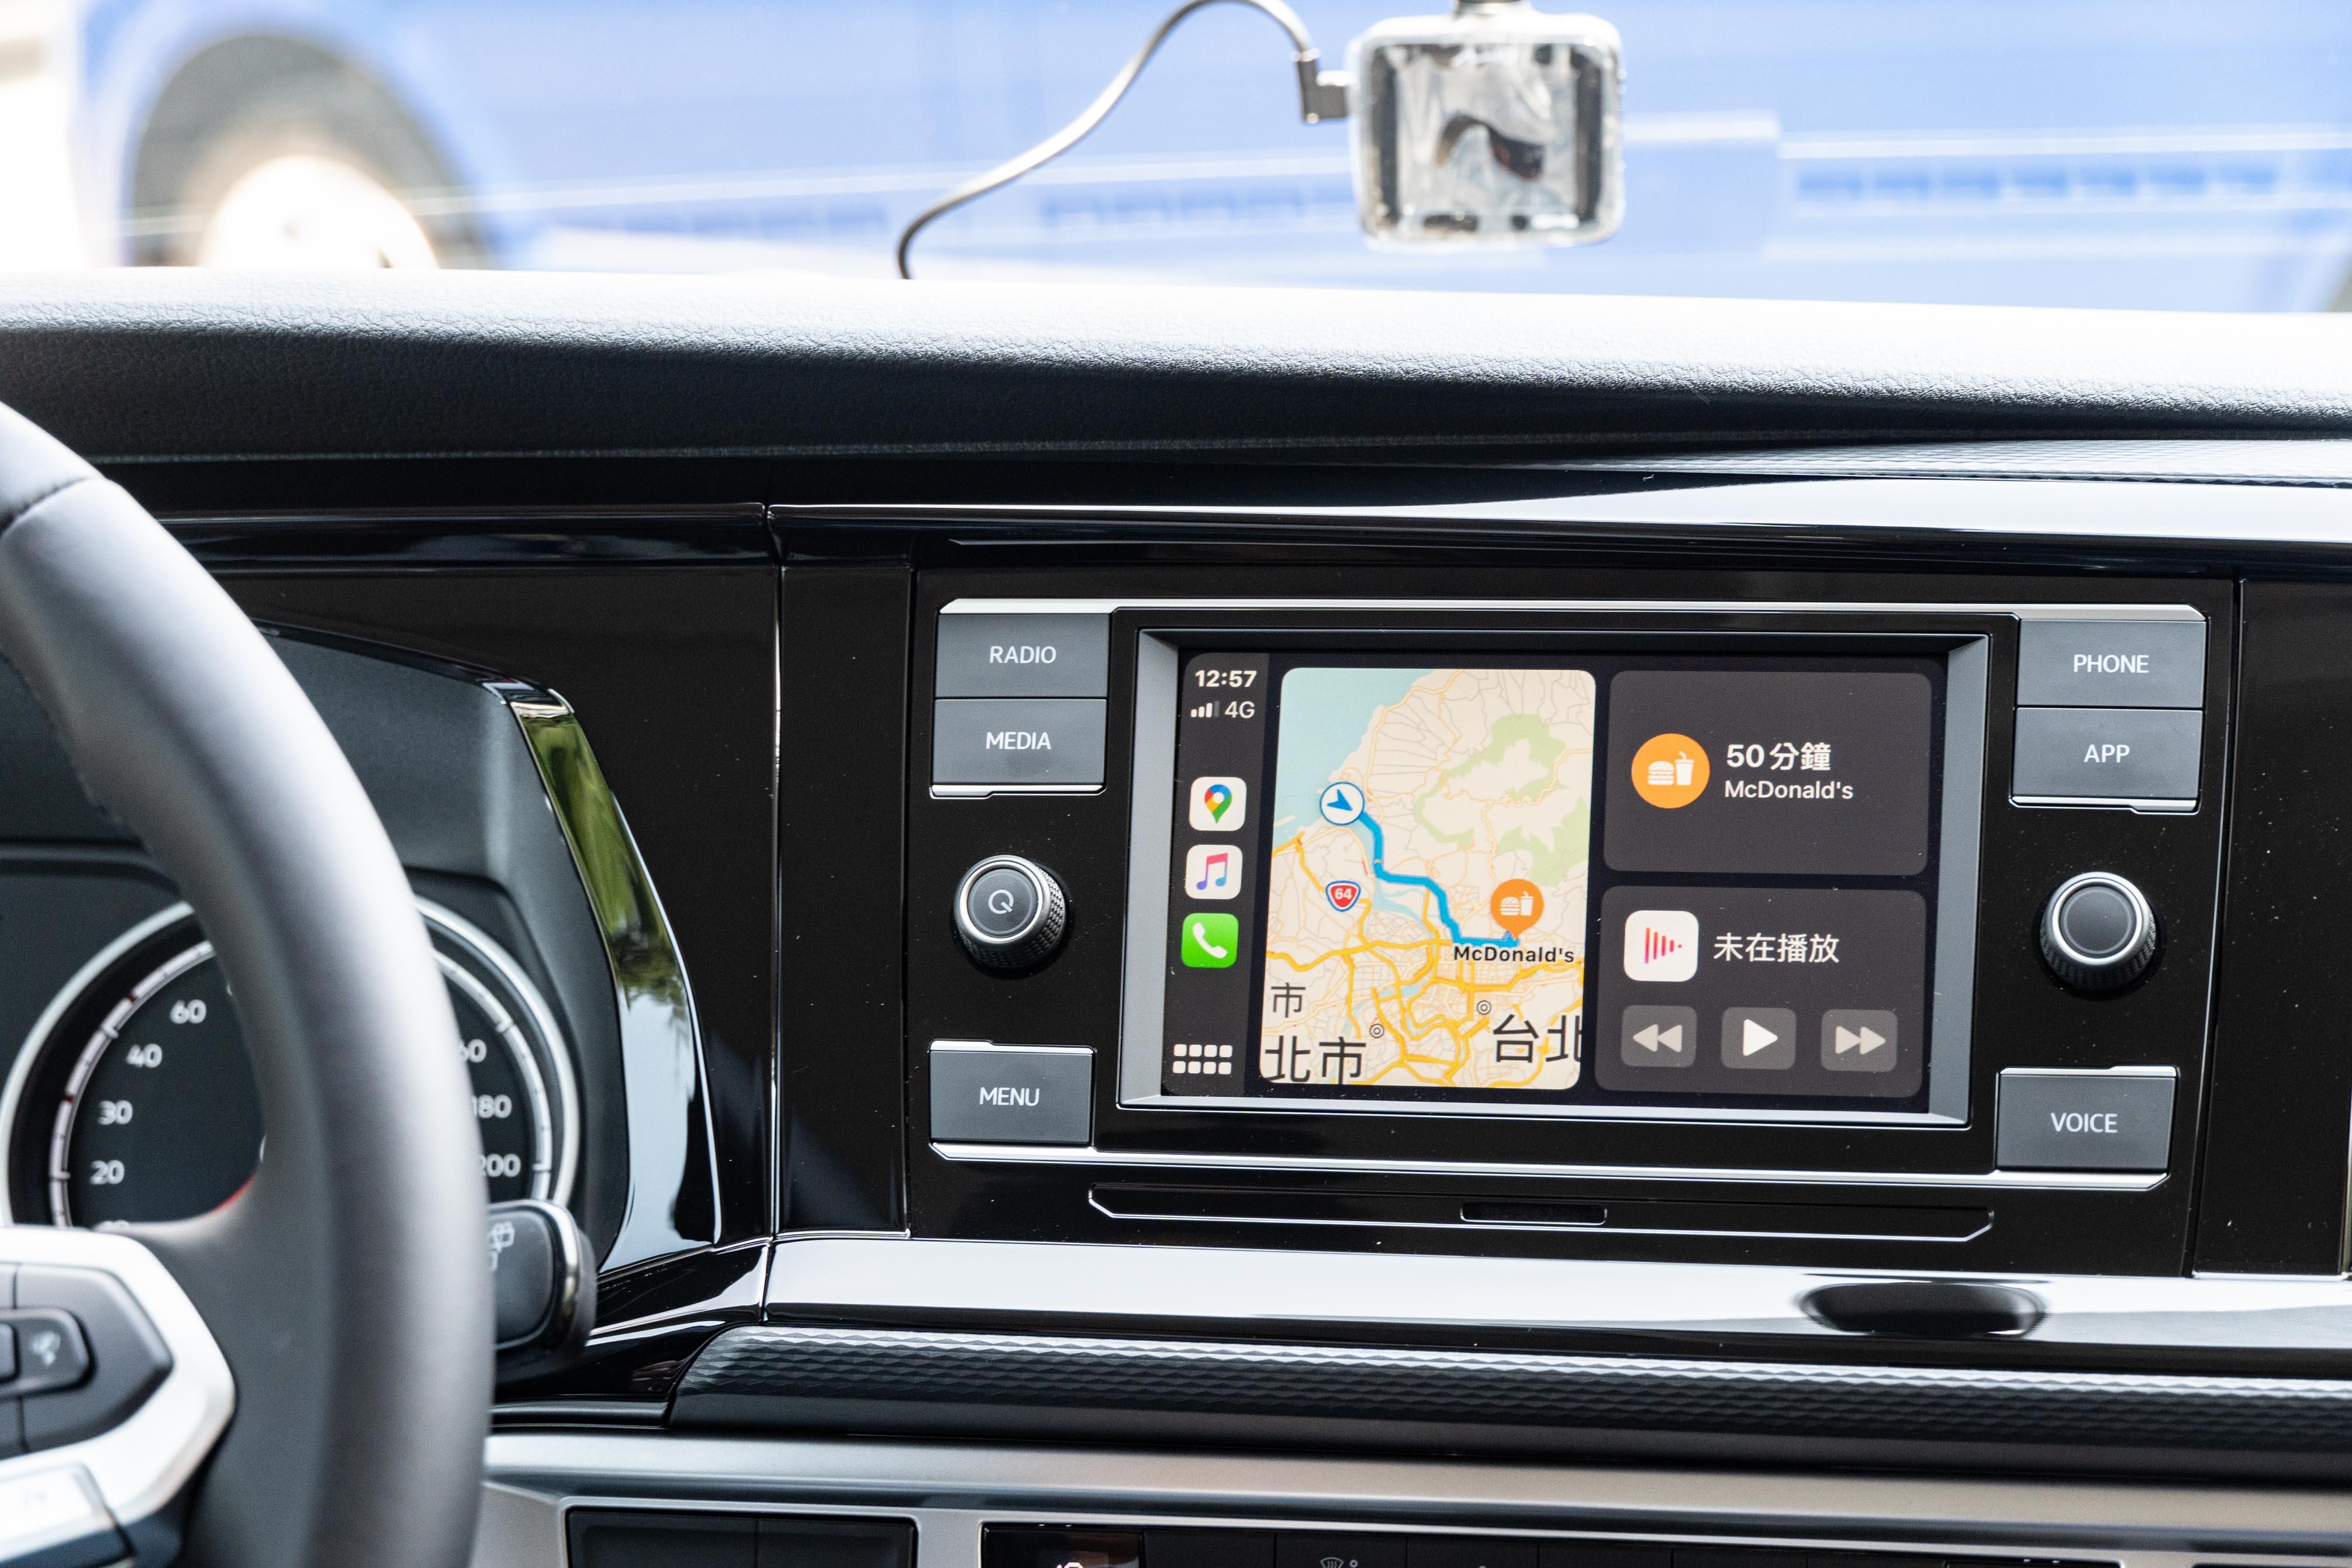 6.5 吋彩色觸控螢幕音響主機支援 Apple CarPay 與 Android Auto。